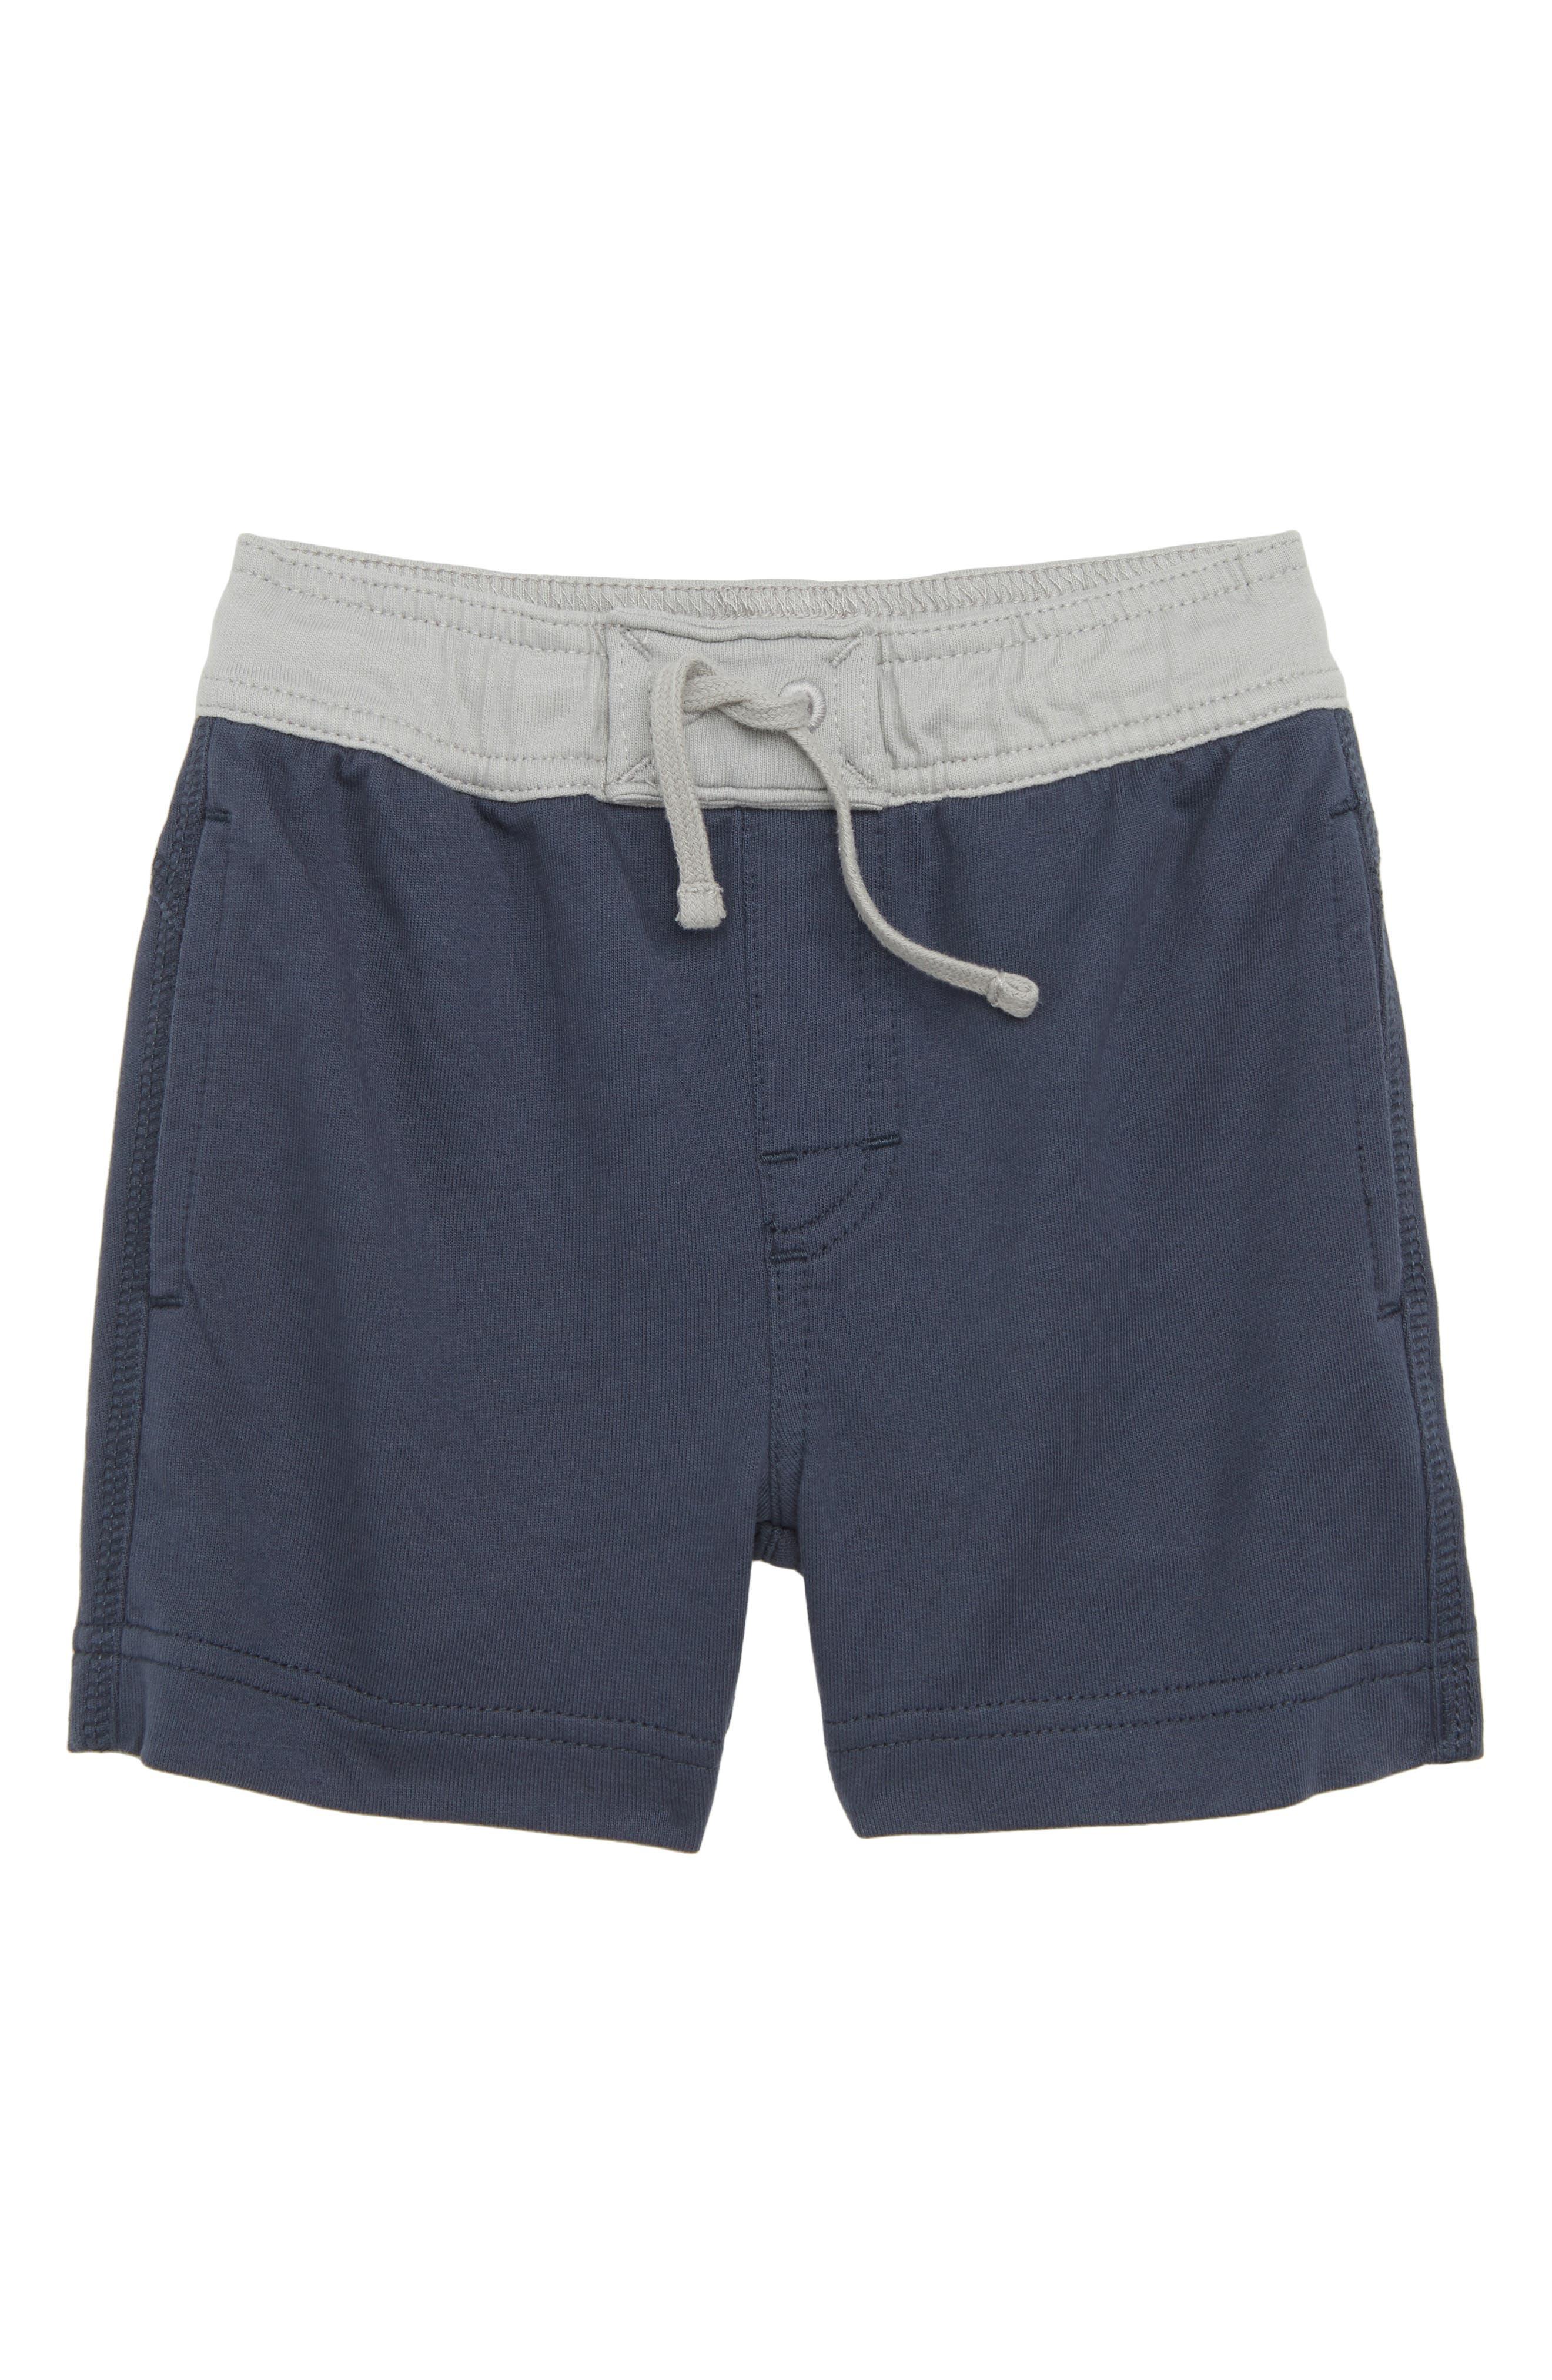 Boardies Surf Shorts,                         Main,                         color, 411